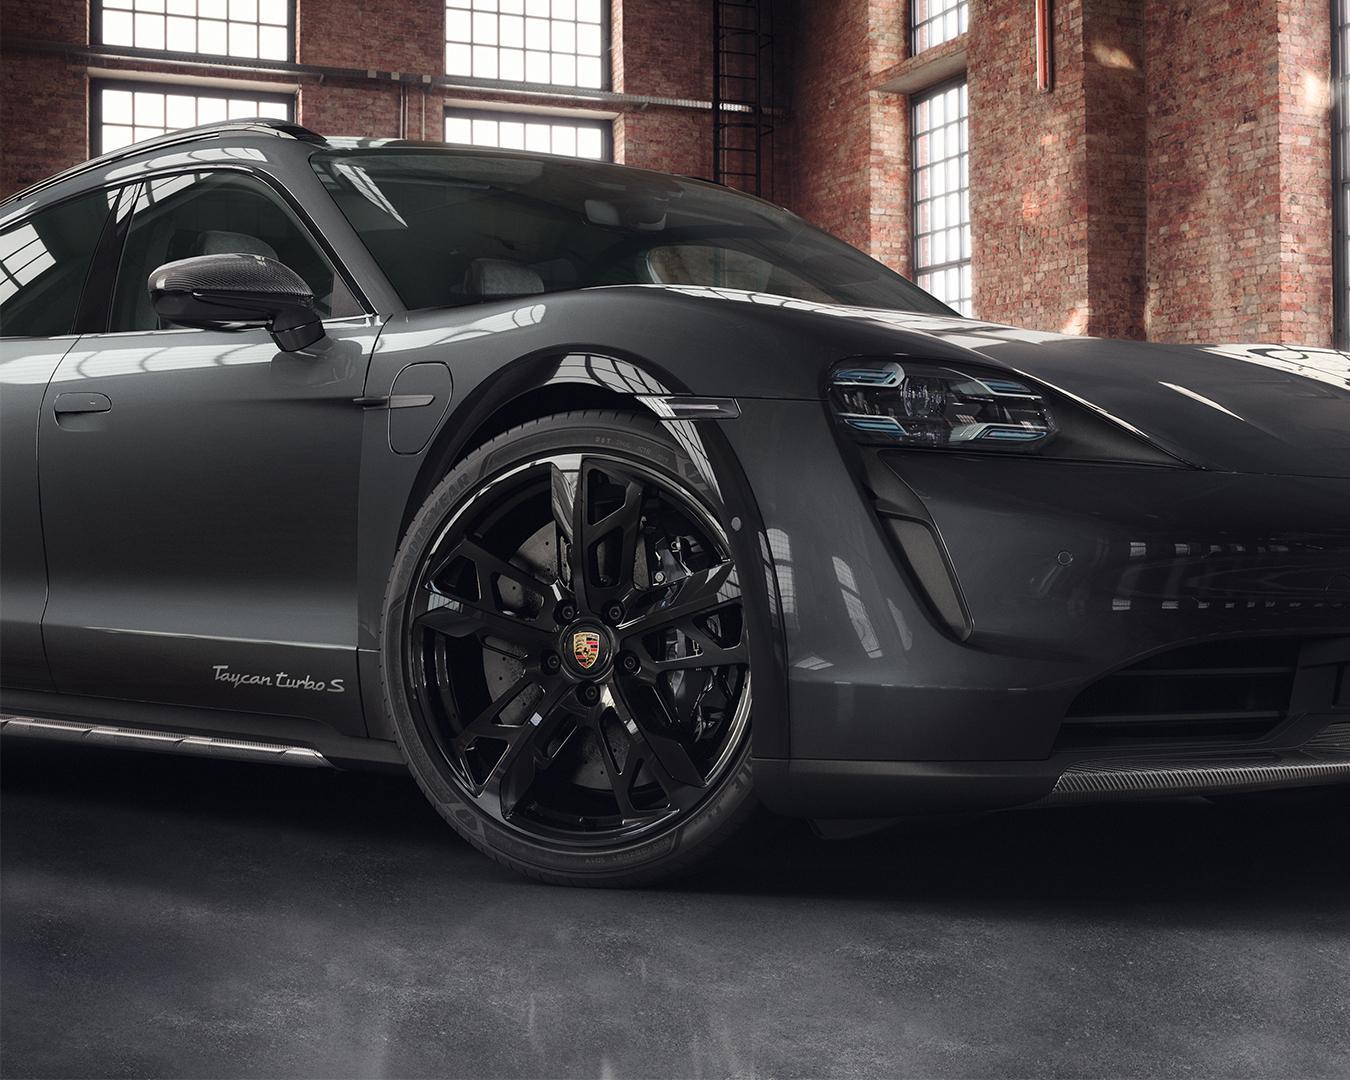 Porsche-Exclusive-Taycan-Cross-Turismo-2